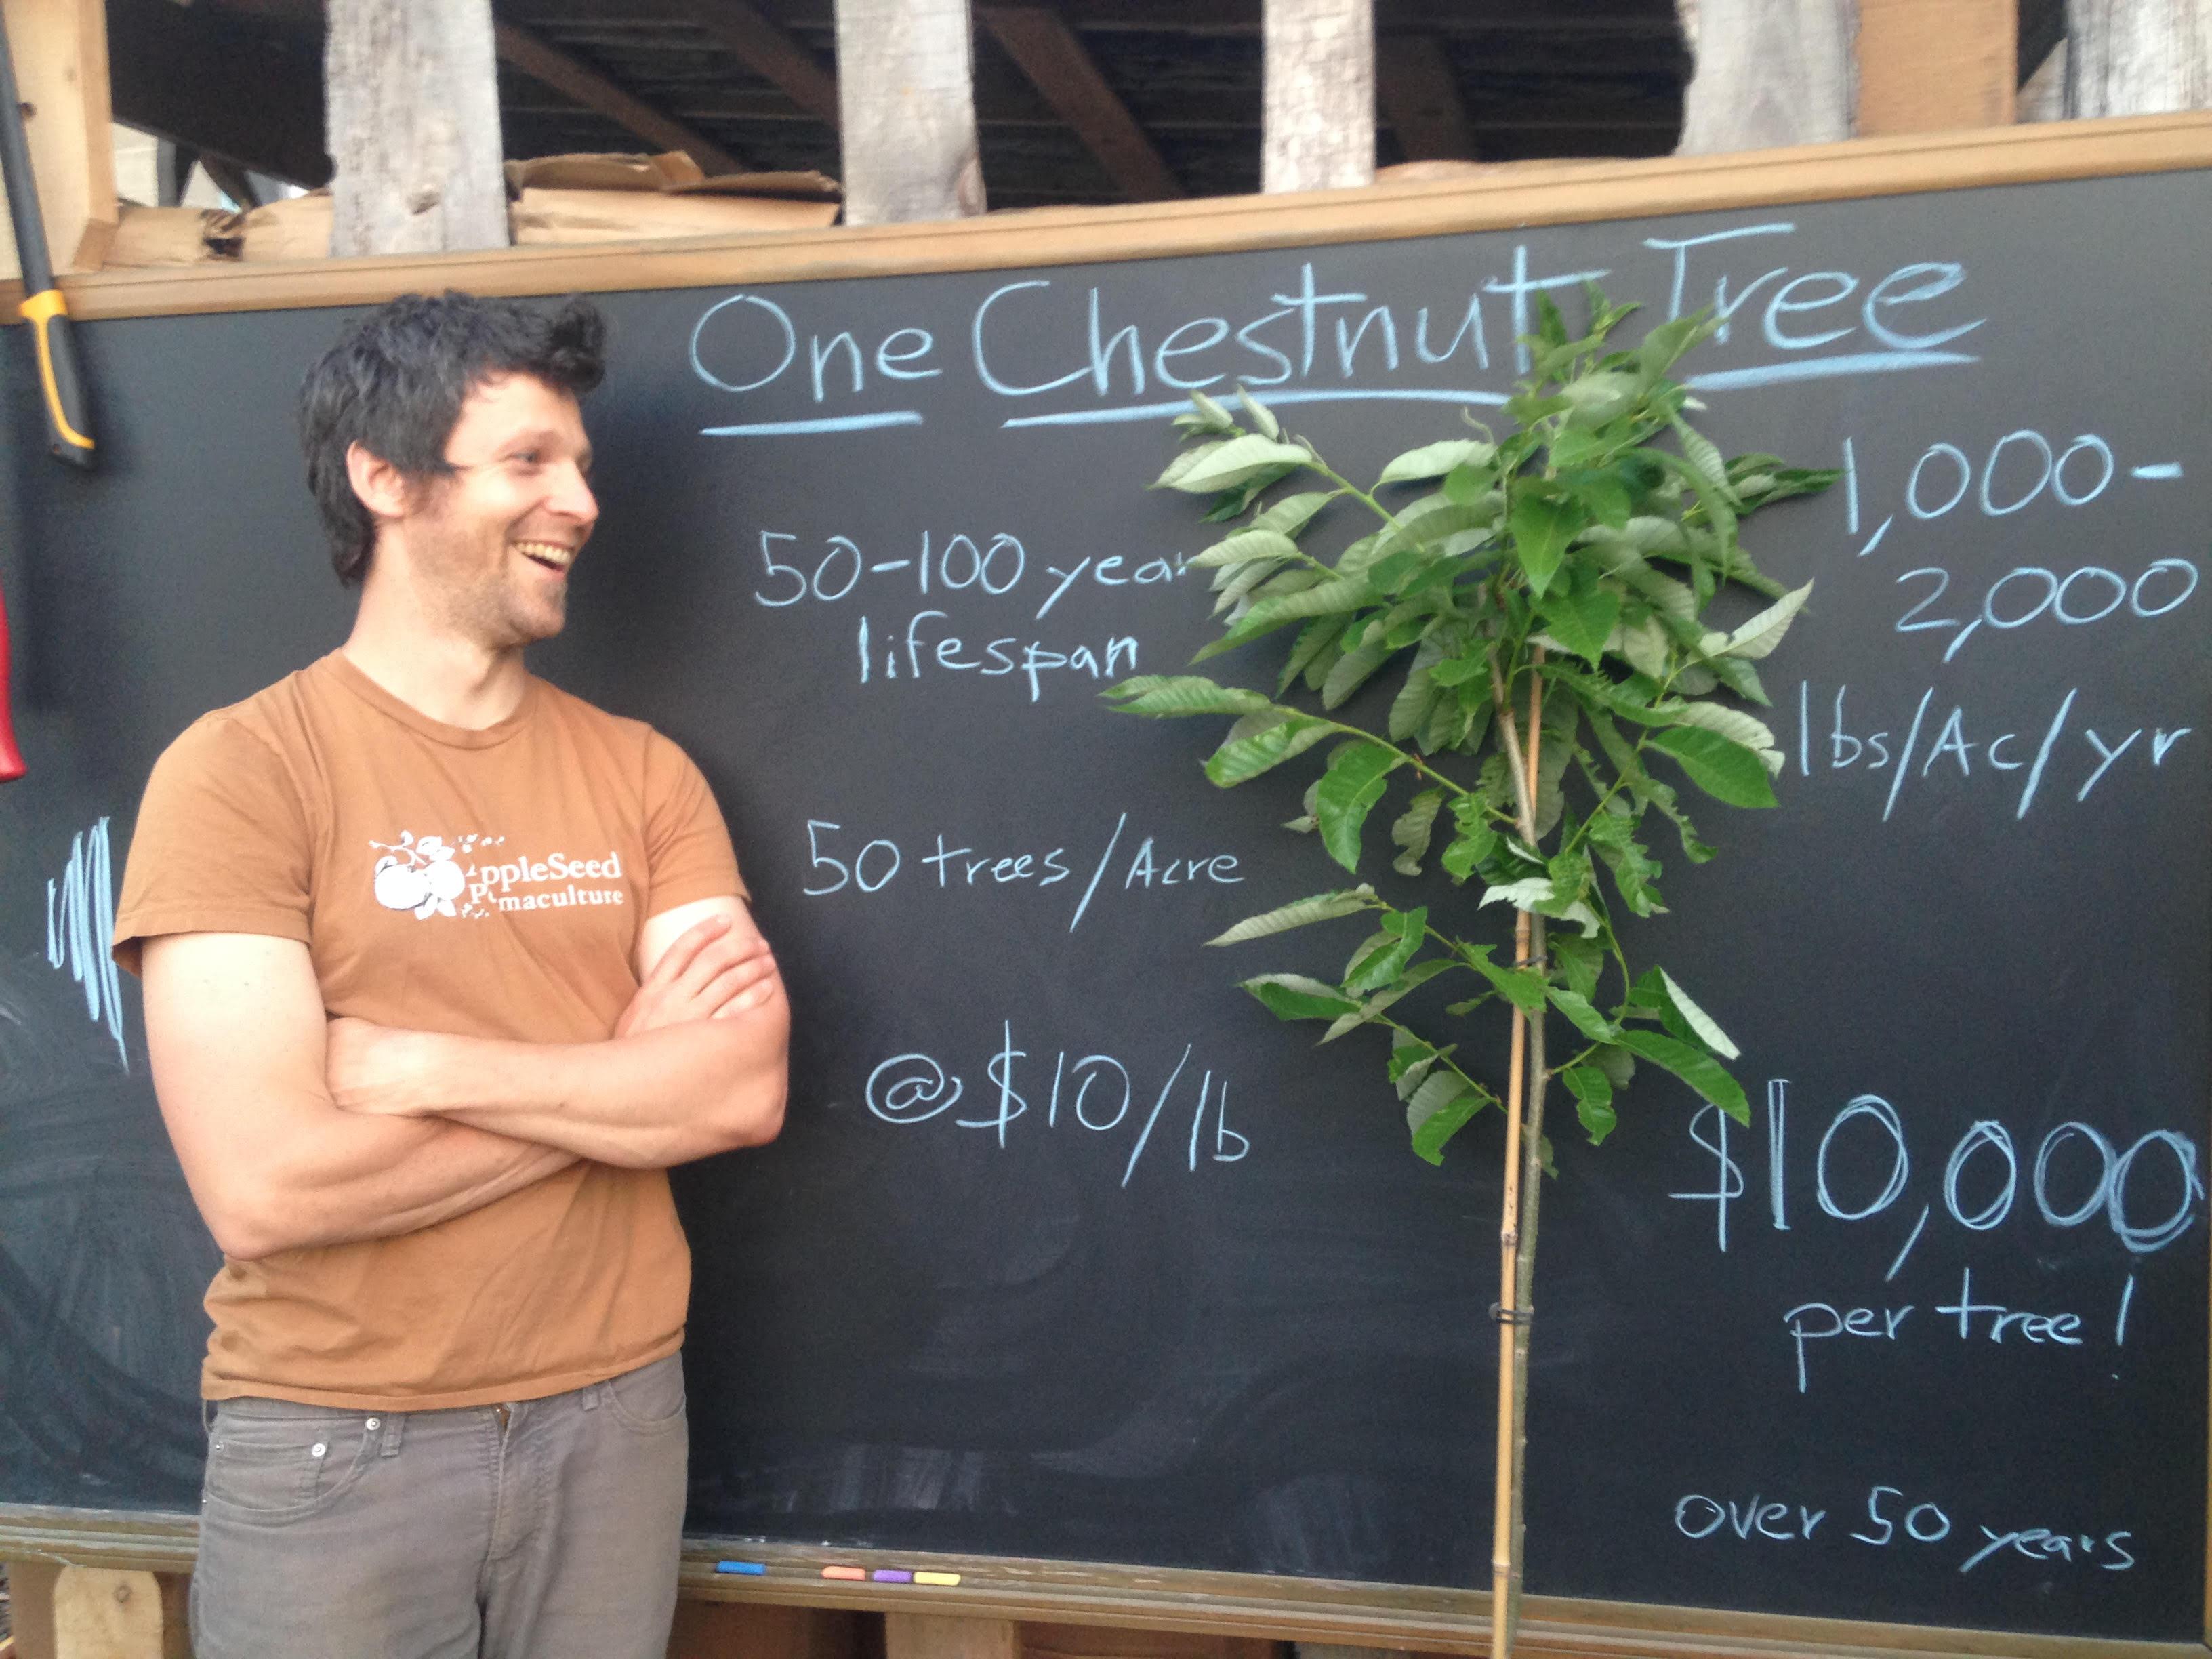 The $10,000 Tree